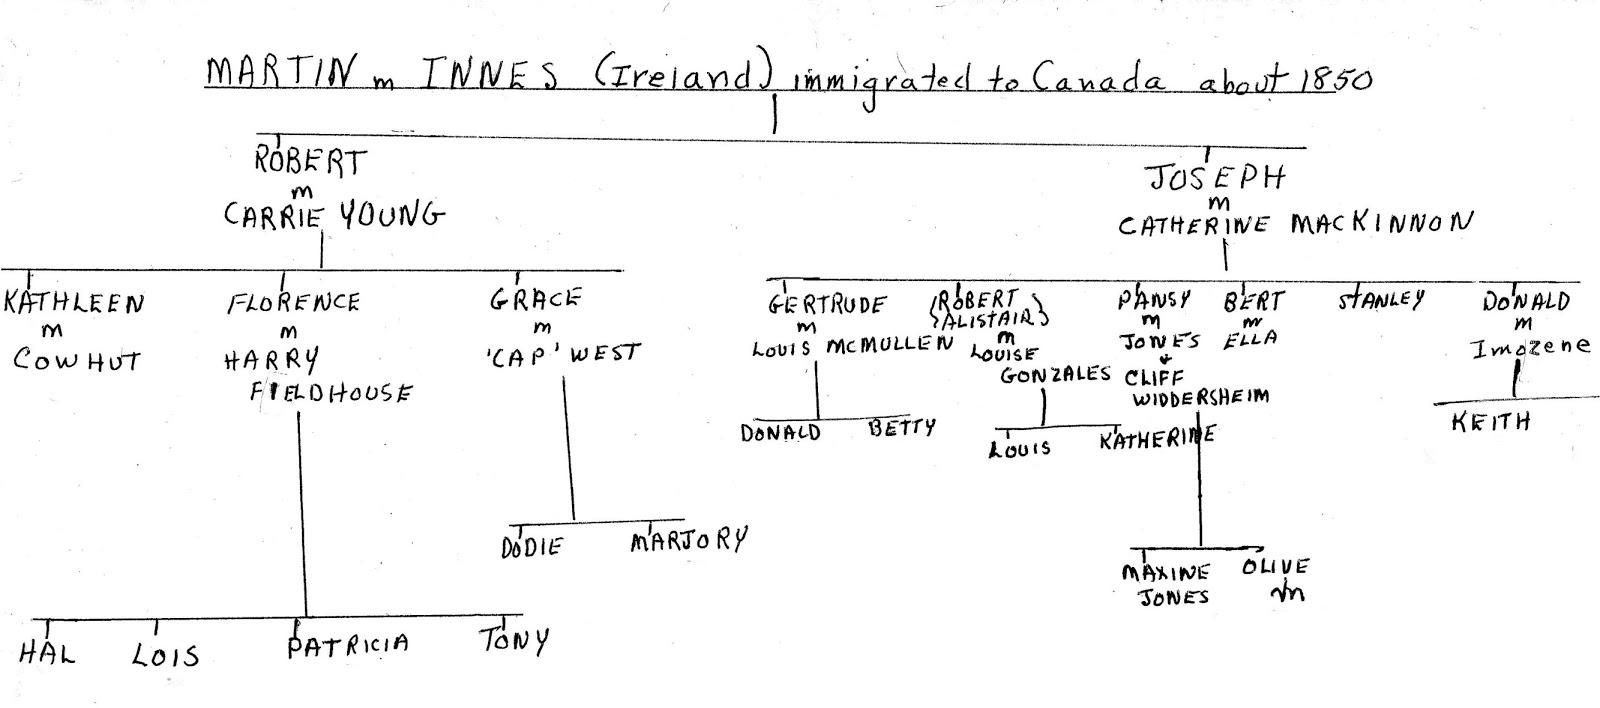 Hand-drawn Family Tree for Martin m. Innes (created Jan 1990)